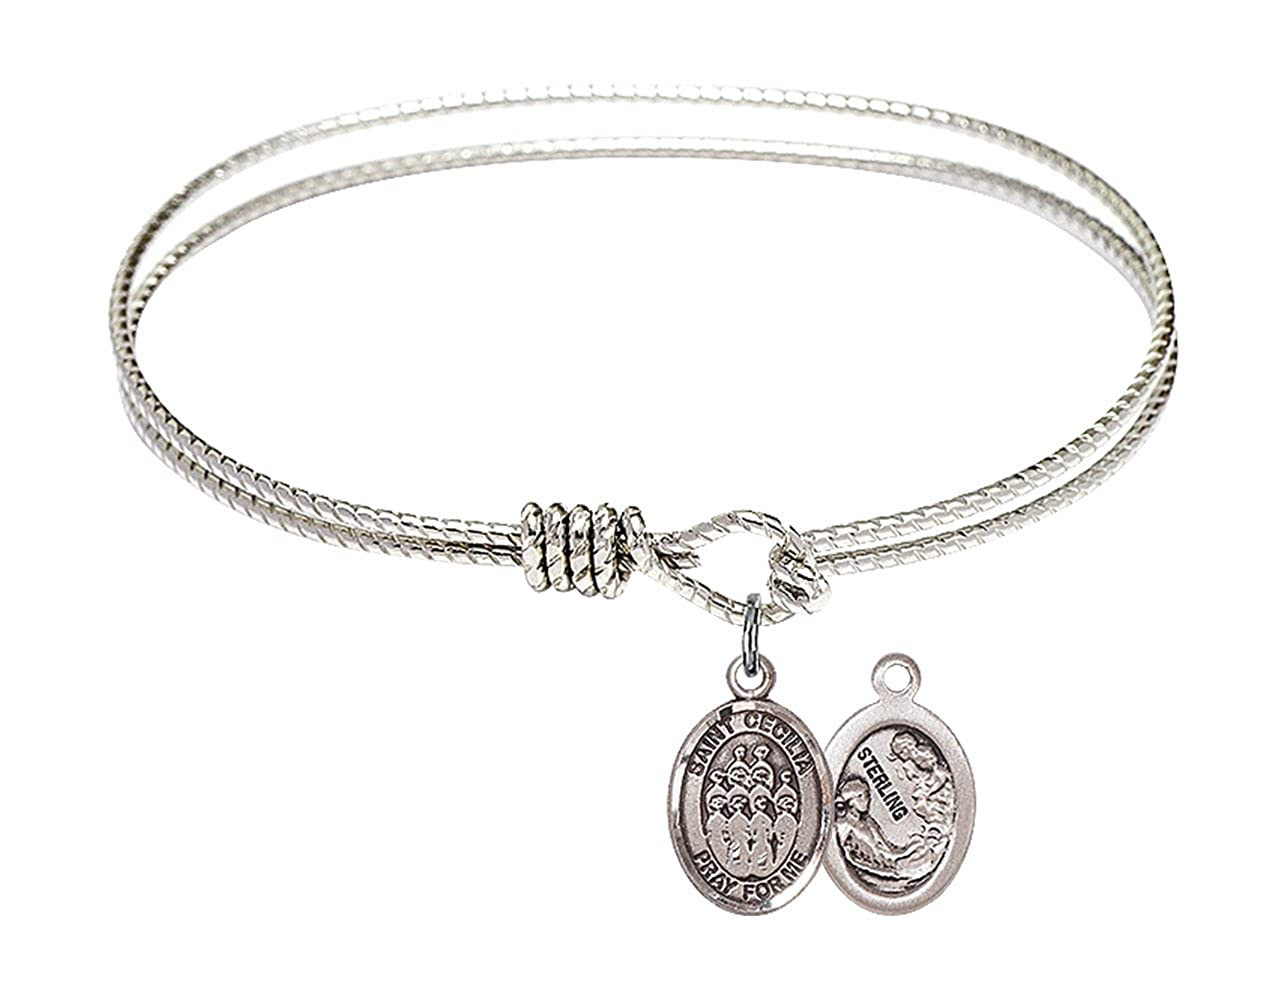 F A Dumont 6 1//4 inch Oval Eye Hook Bangle Bracelet a St Cecilia//Choir Charm.